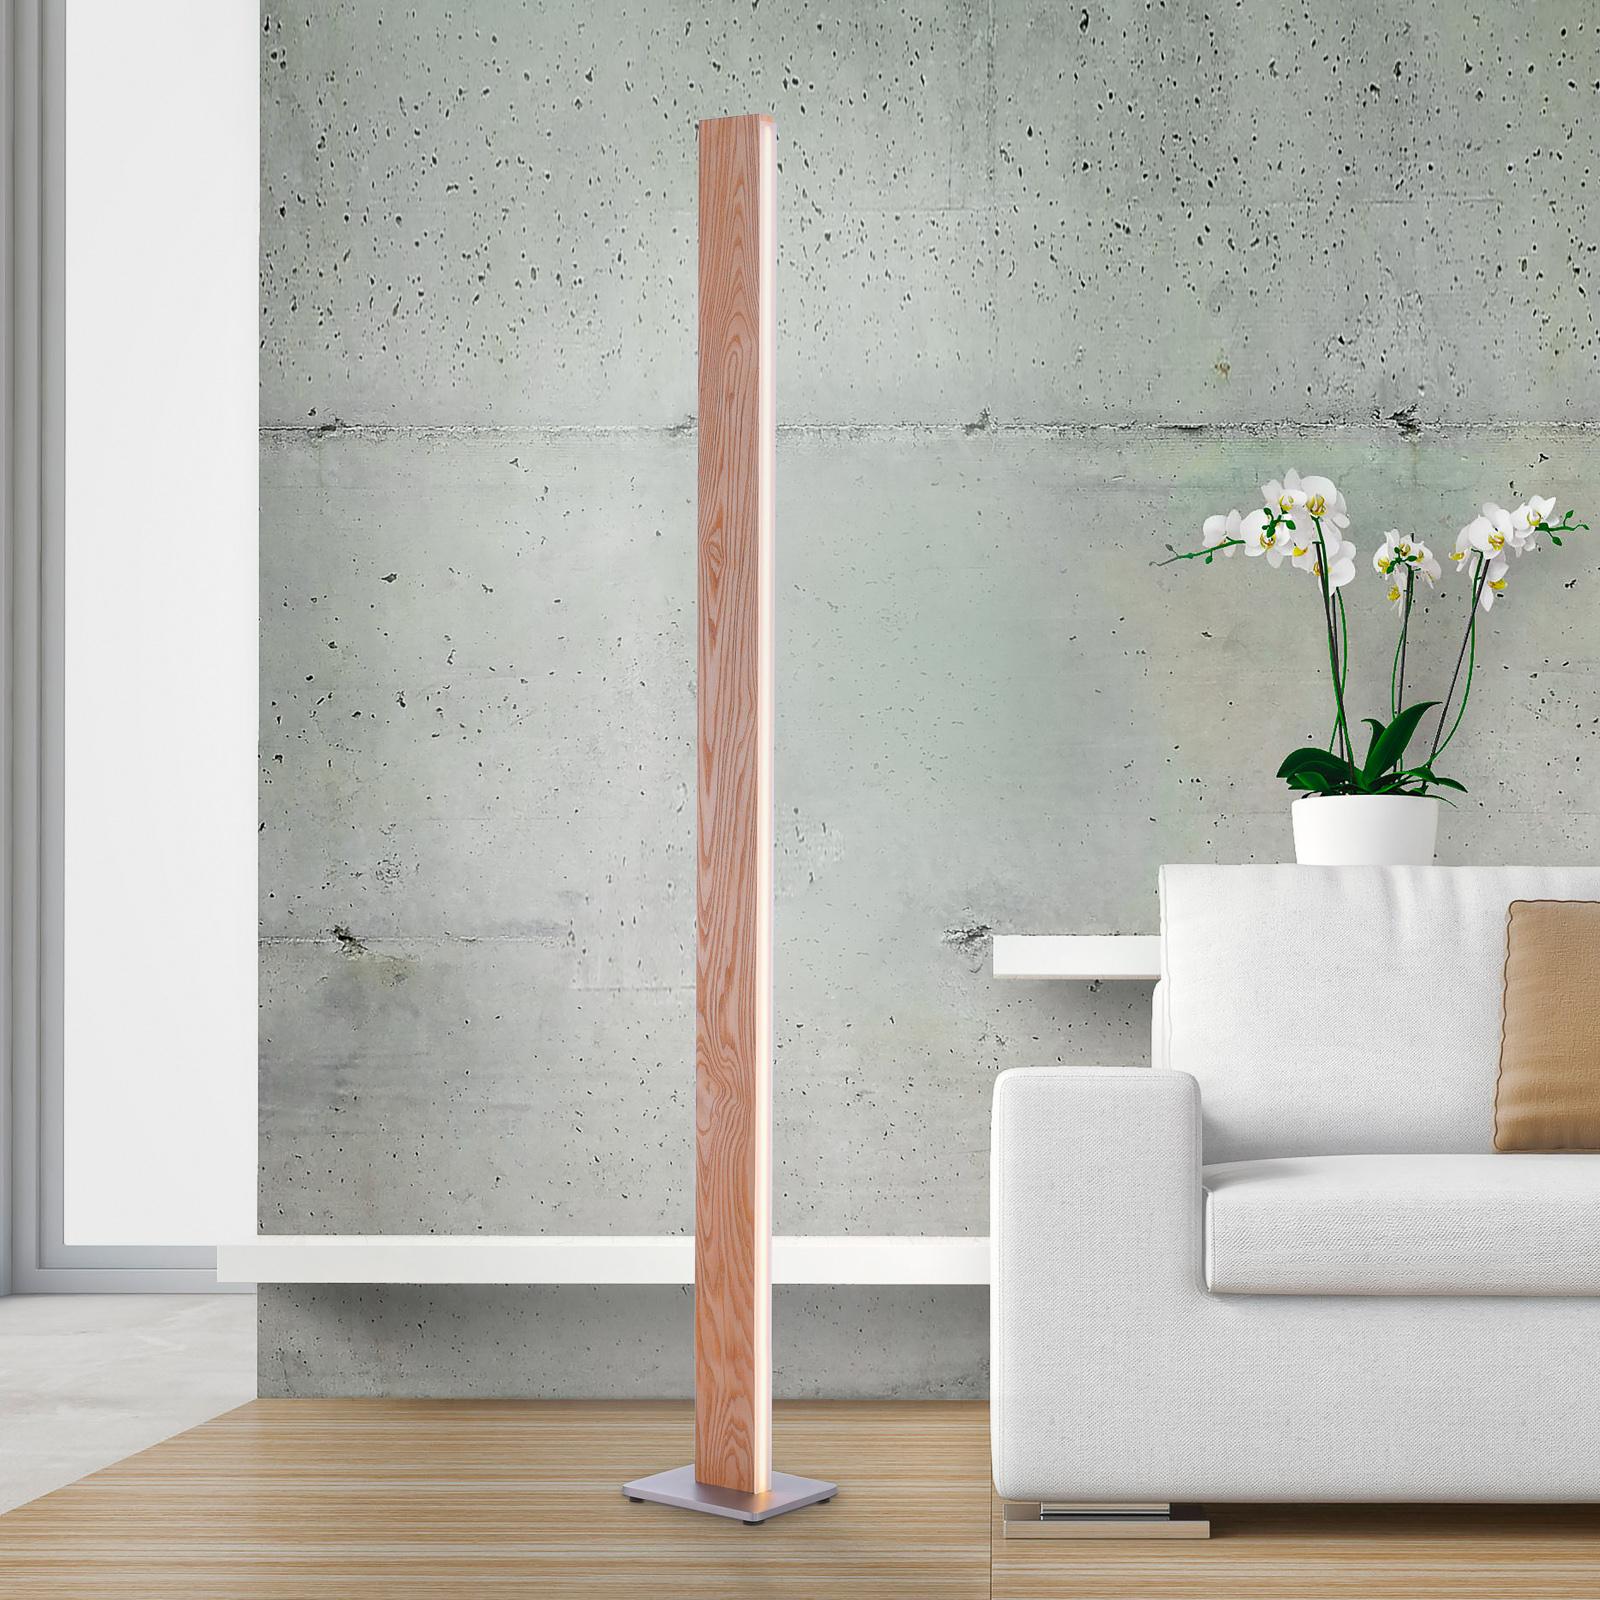 Paul Neuhaus Q-TIMBER LED-Stehleuchte mit Holz